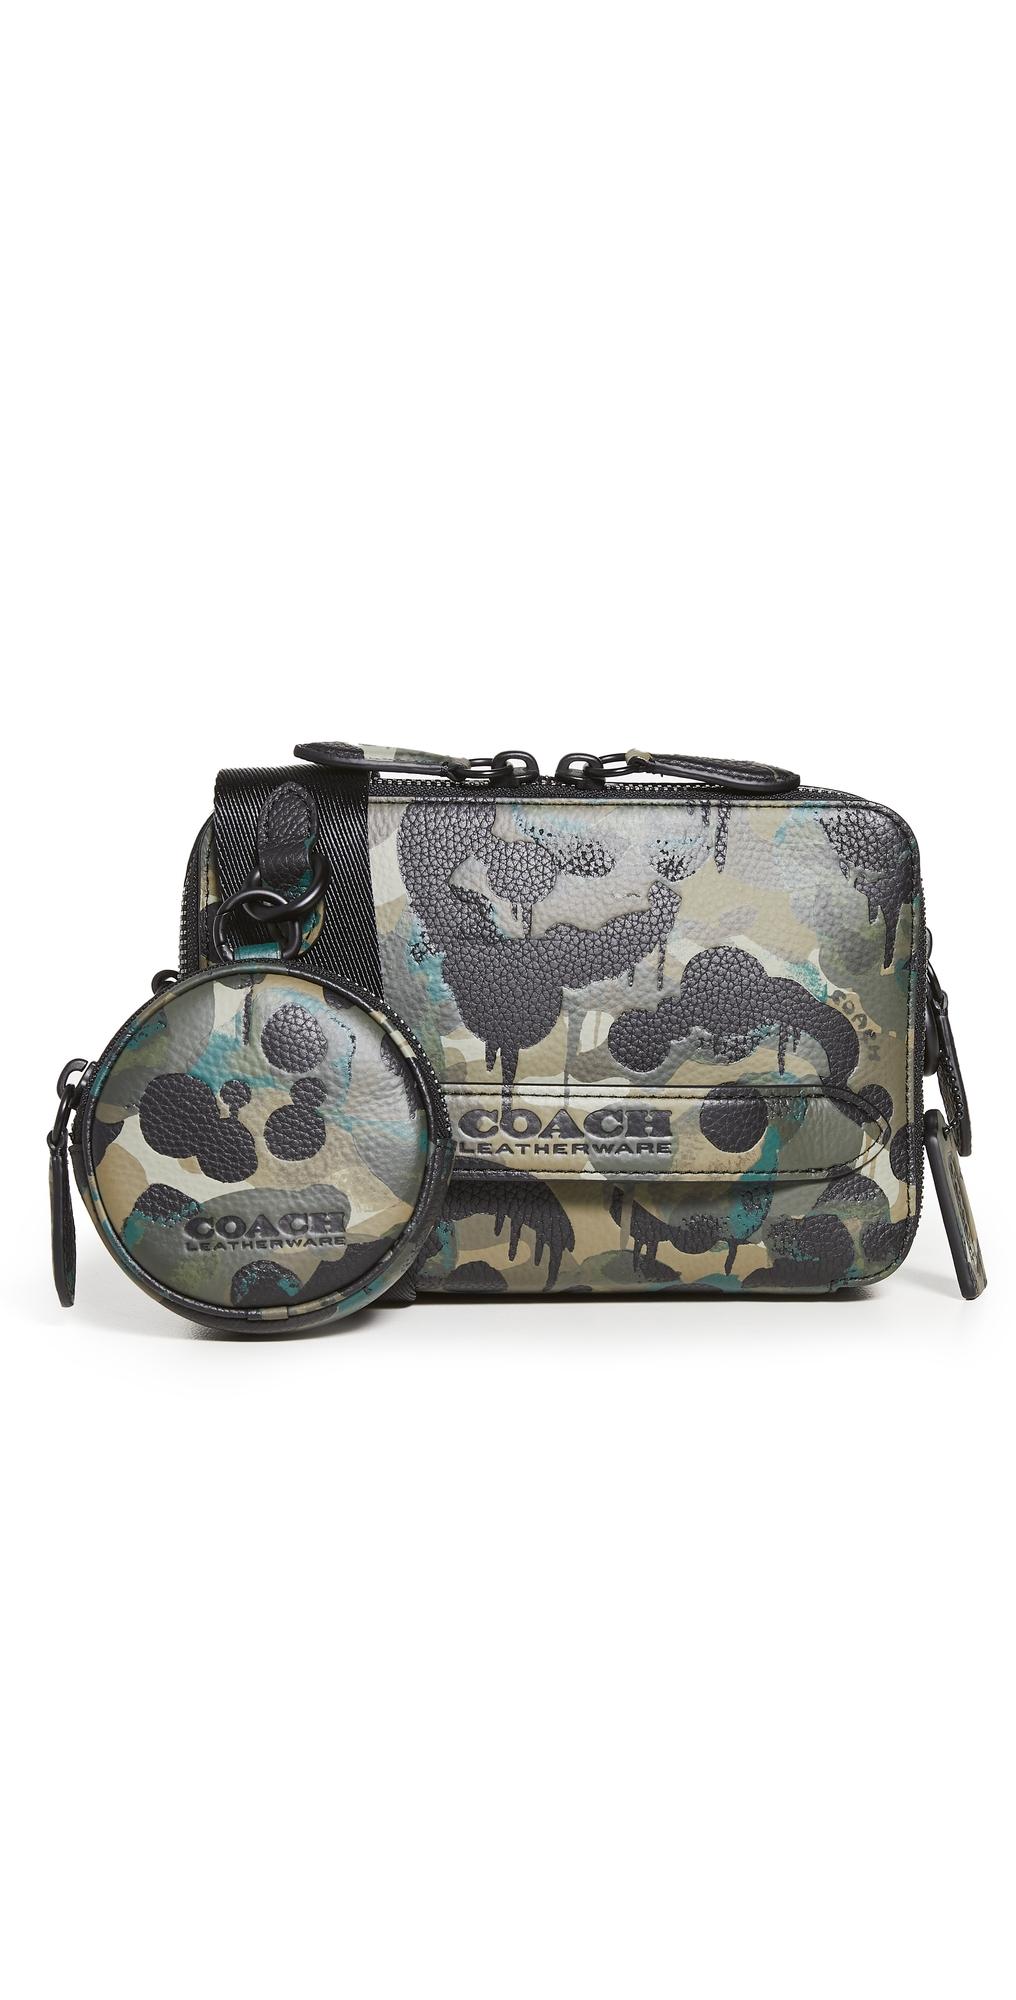 Charter Crossbody Bag